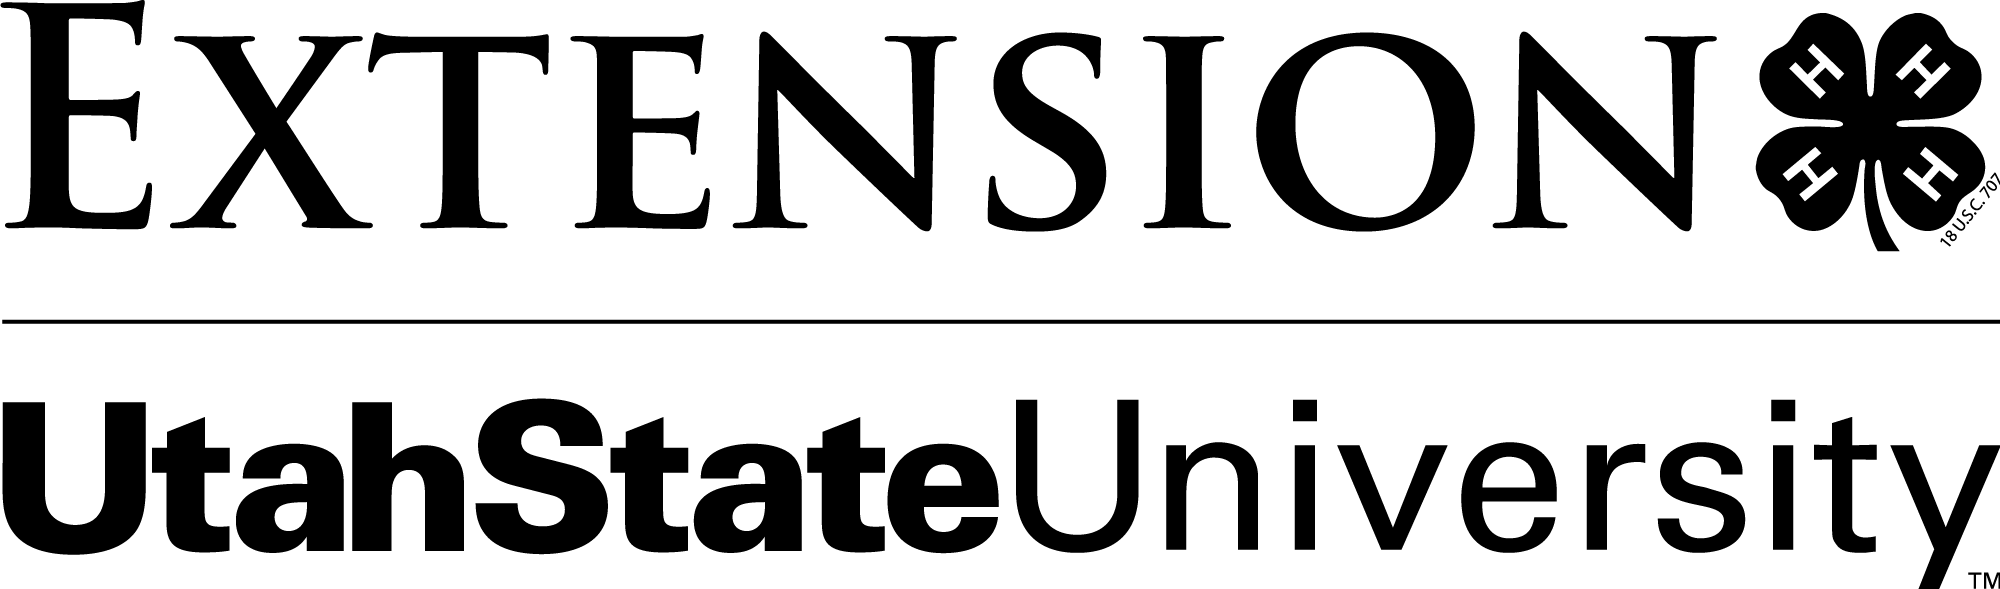 Extension_Black